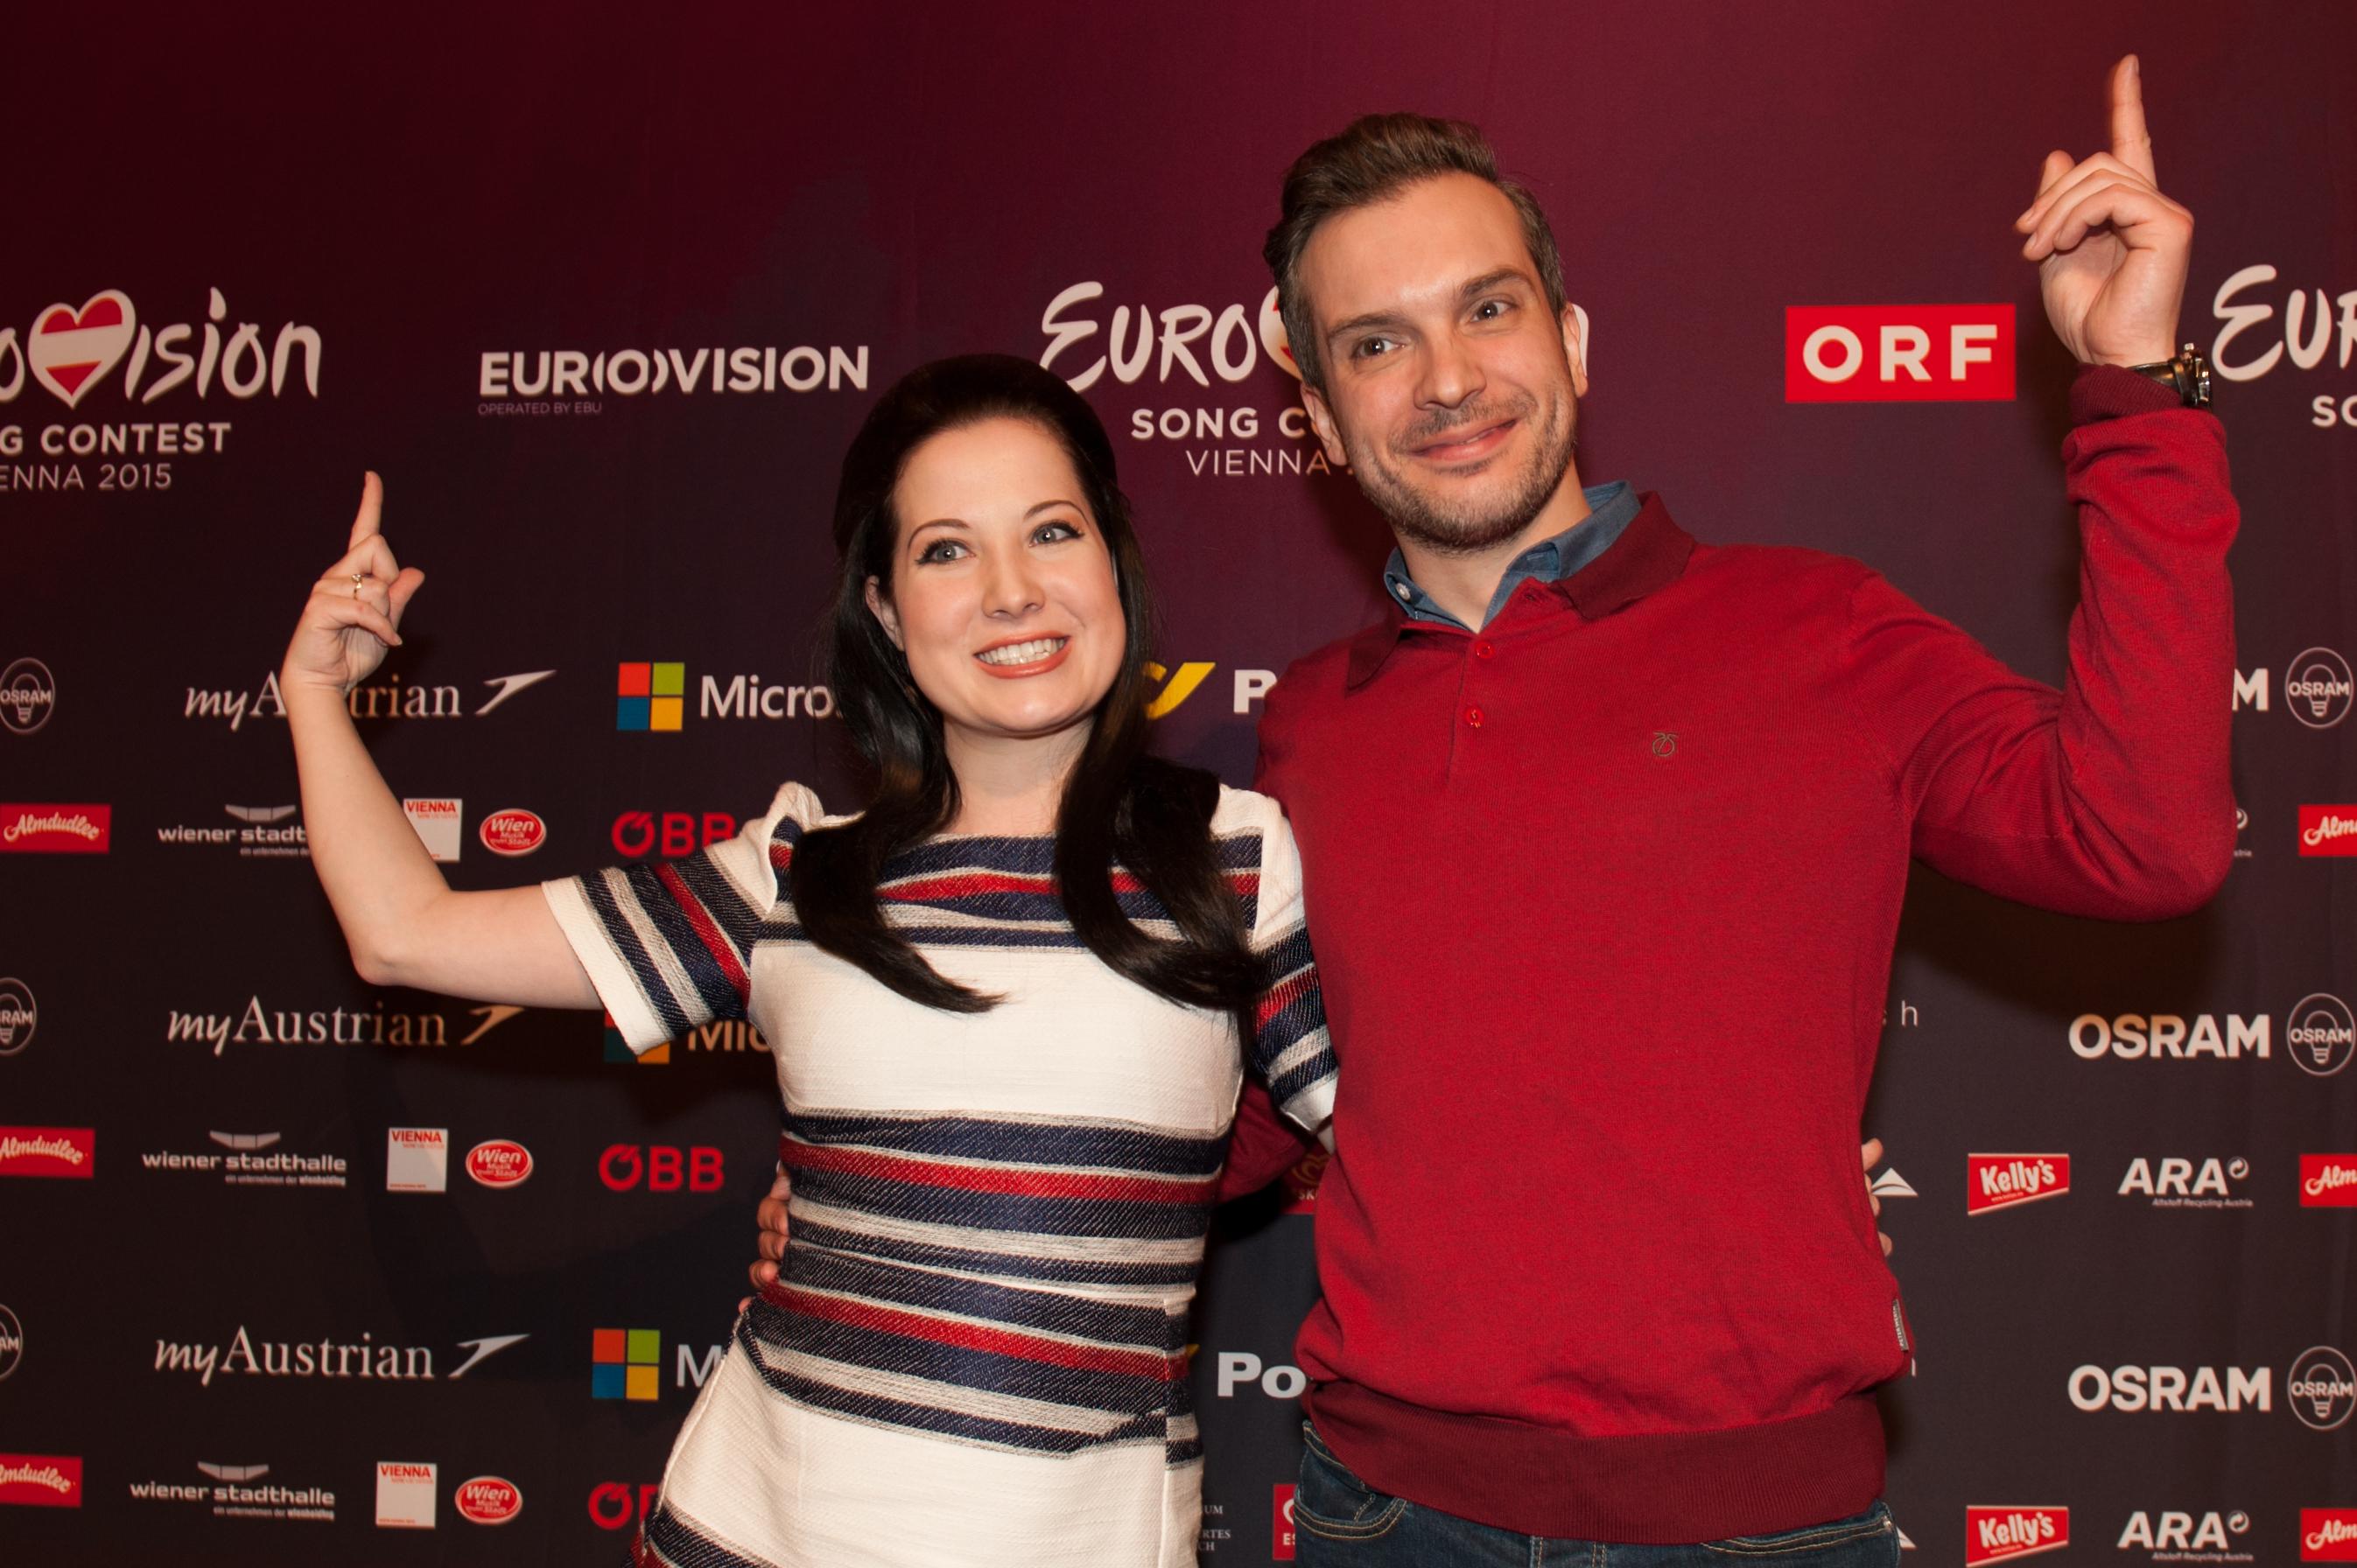 Представители Великобритании на Евровидение 2015